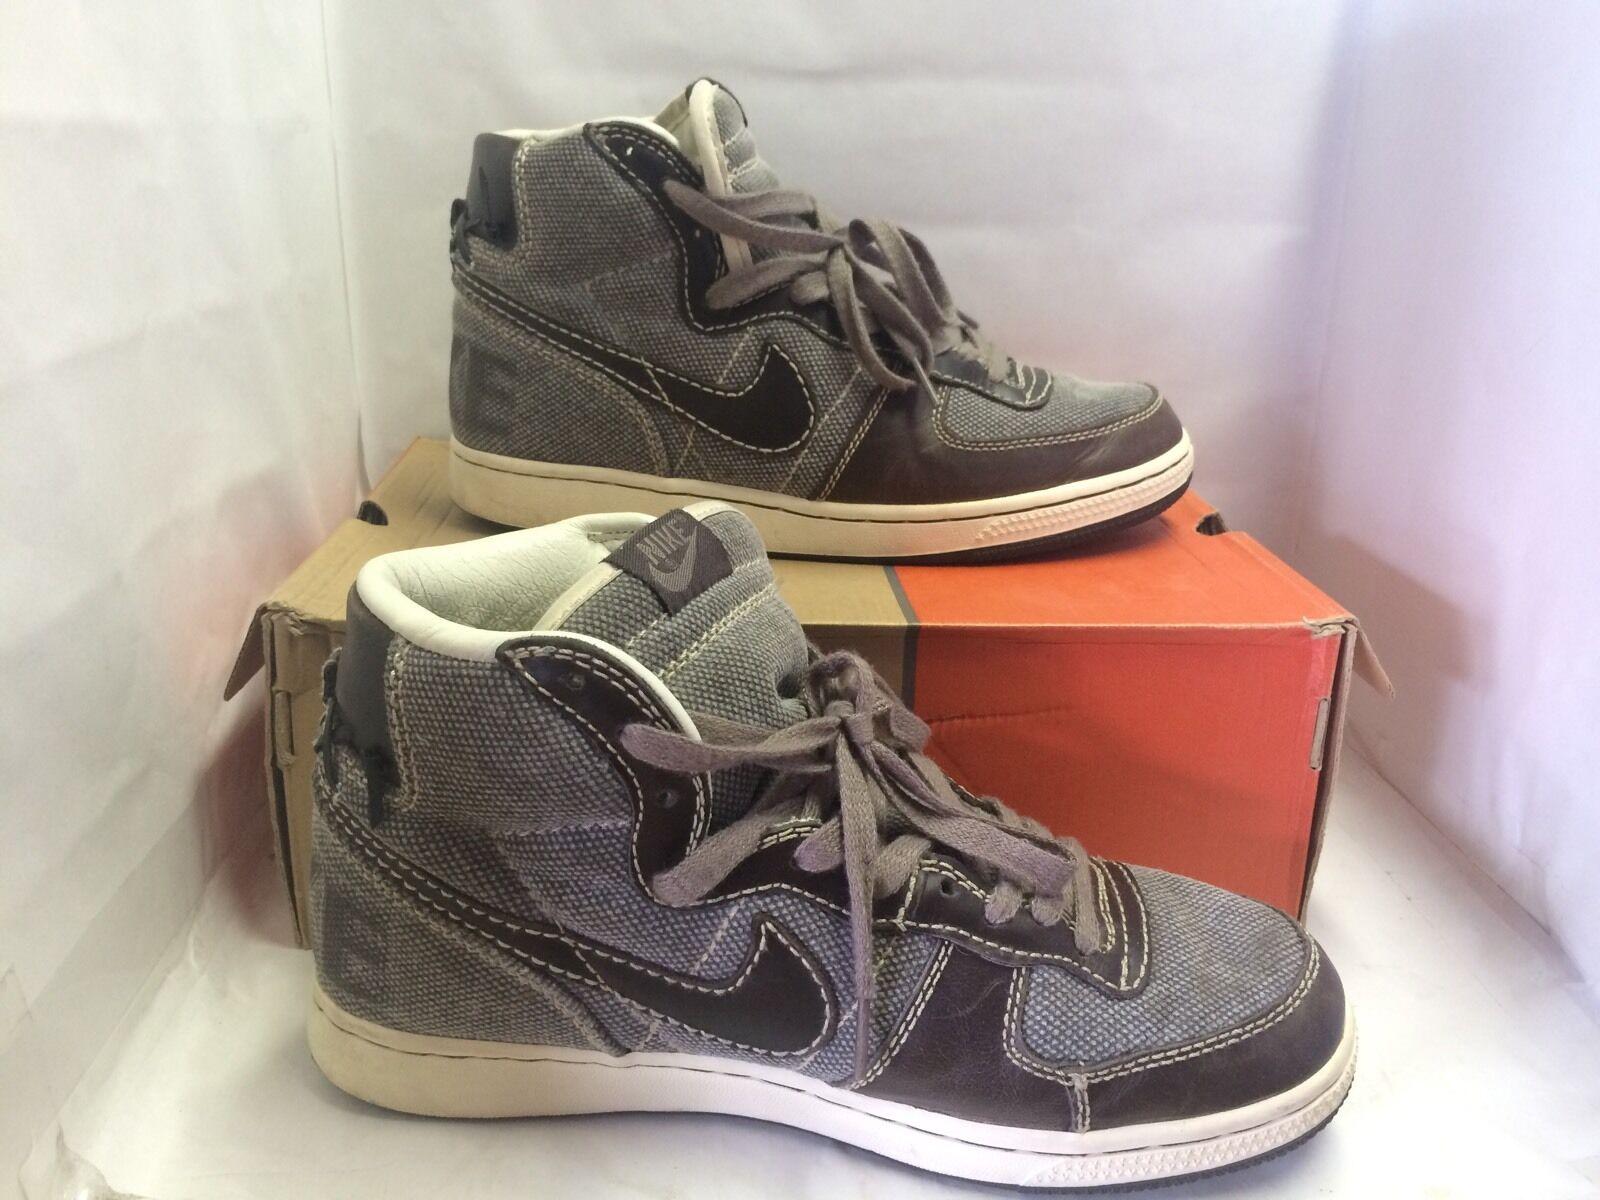 Nike Terminator (Baseball Pack) Size 9.5 9.5 9.5 Used Supreme 9a76a6